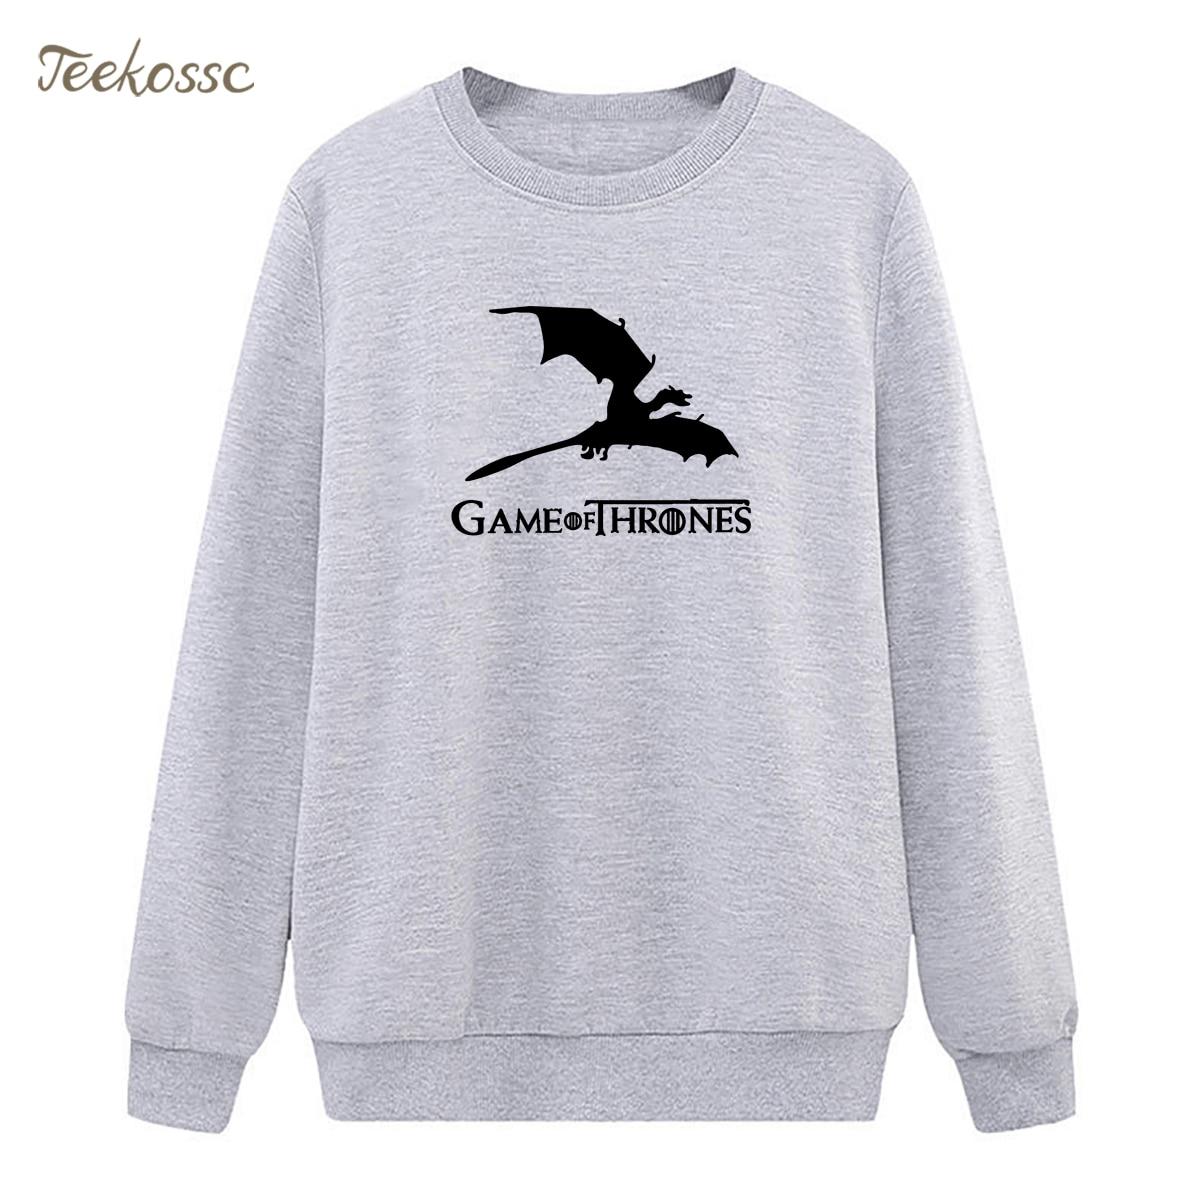 Game of Thrones Sweatshirt Dragons Hoodie 2018 Hipster Winter Autumn Women Lasdies Pullover Fleece Warm Loose Hip Hop Streetwear